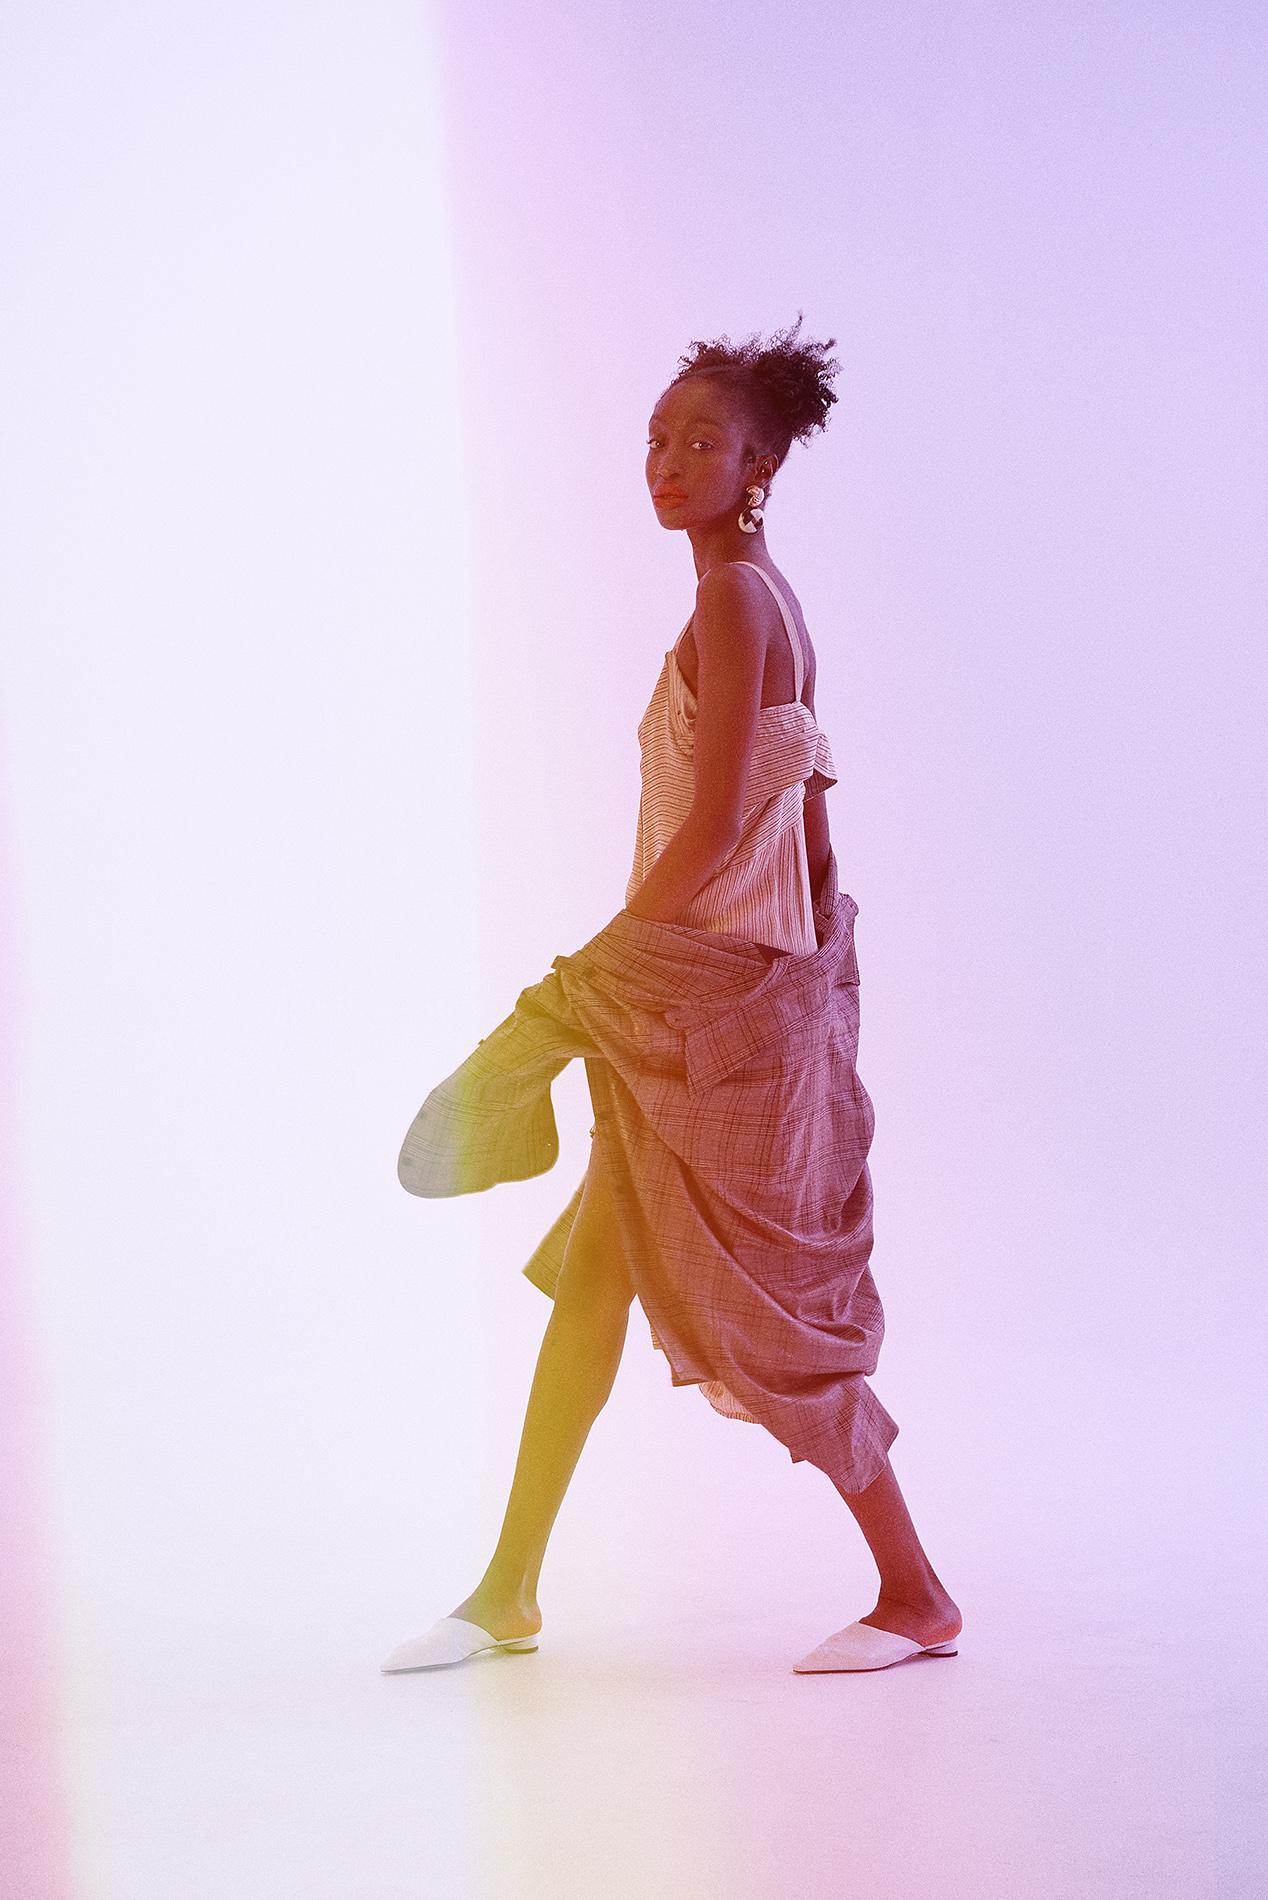 Jacket : HUØNG NGUYEN     Dress : HUØNG NGUYEN     Earring : Zara        Shoes : Zara